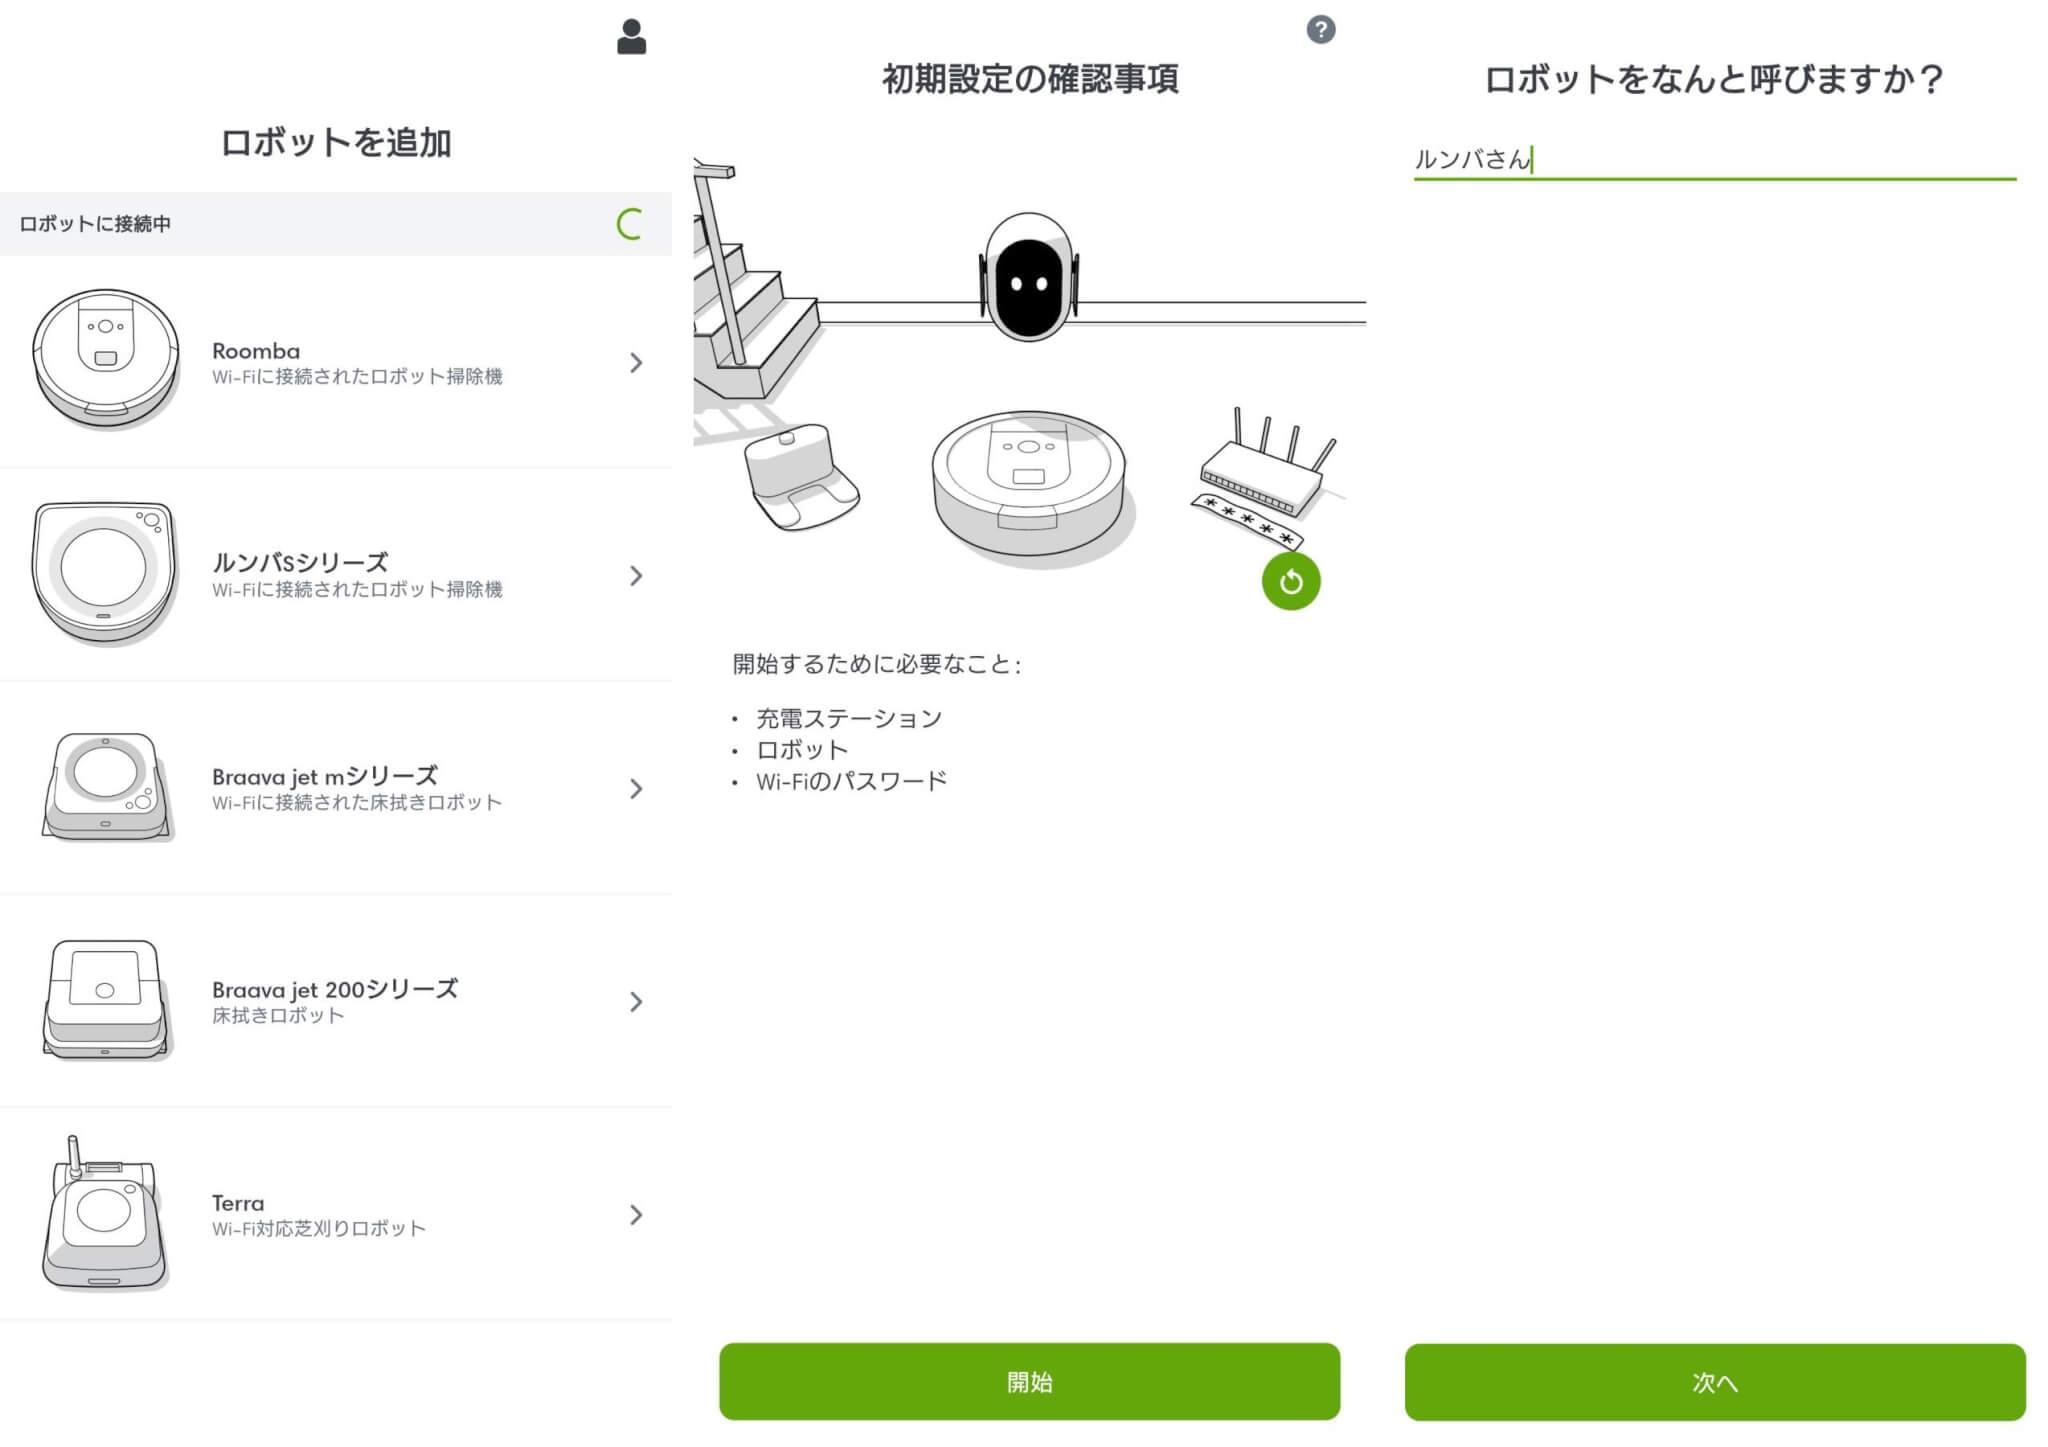 iRobotルンバ692を実際に使ってレビュー スマホ連携も簡単